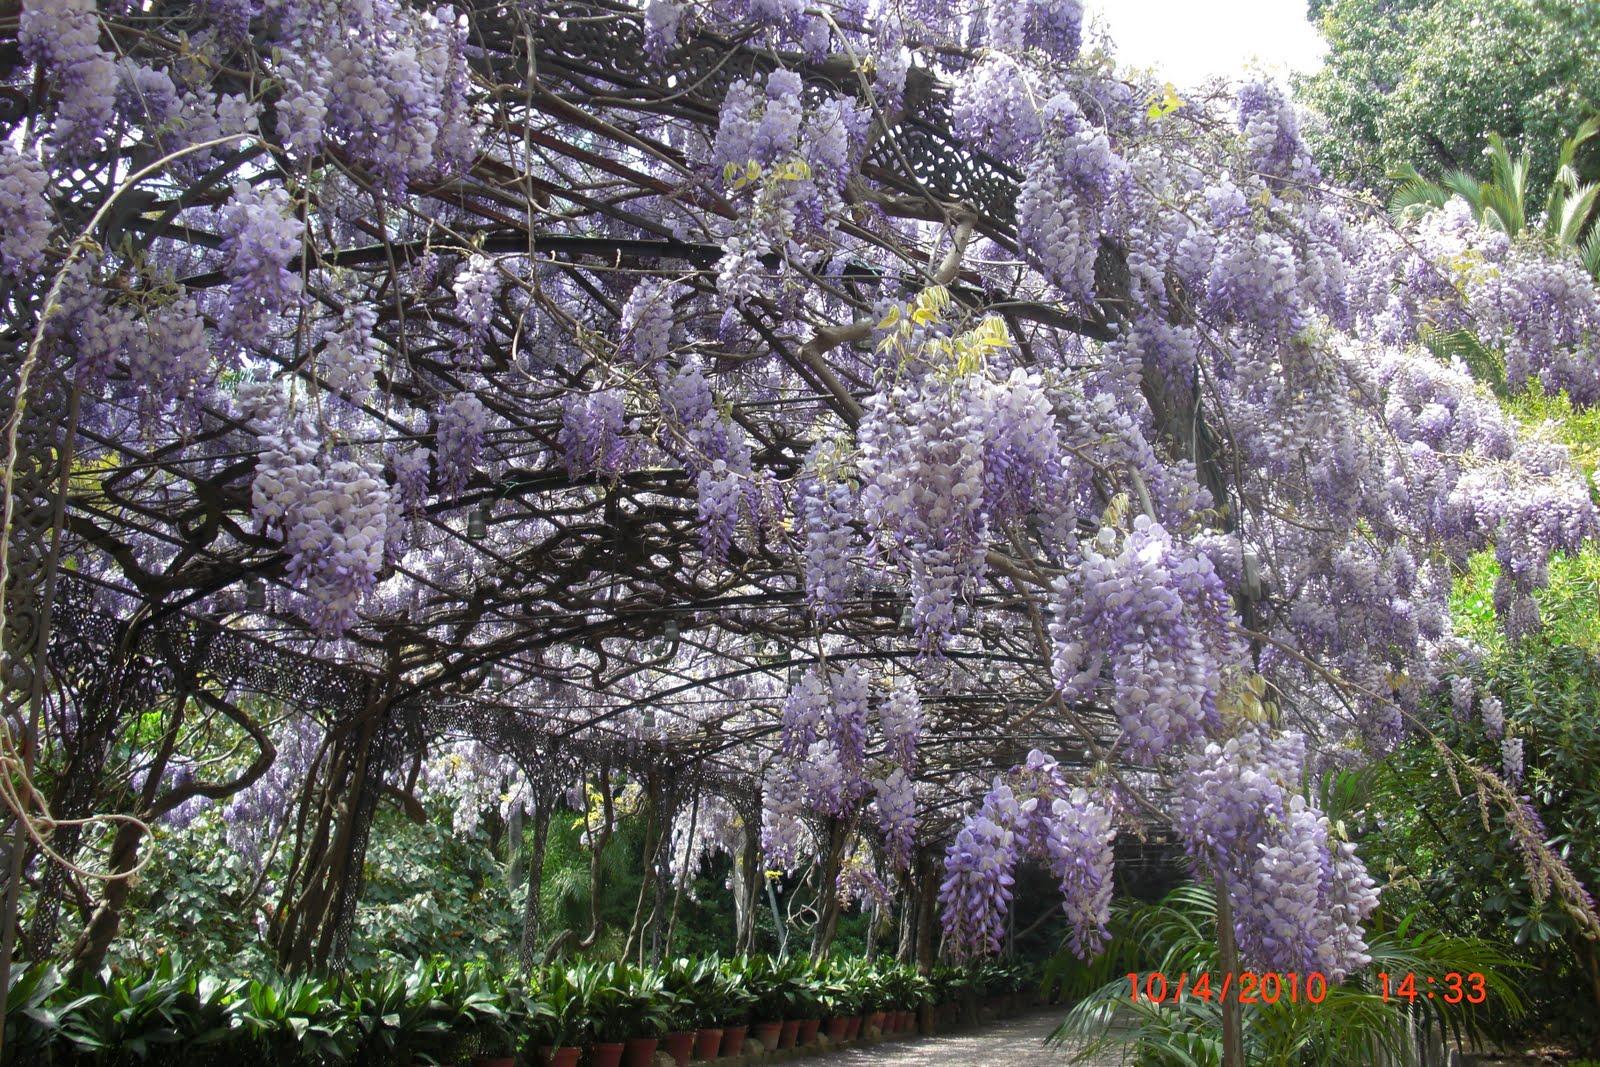 Nuestra m laga jard n bot nico la concepci n for Jardin botanico la concepcion